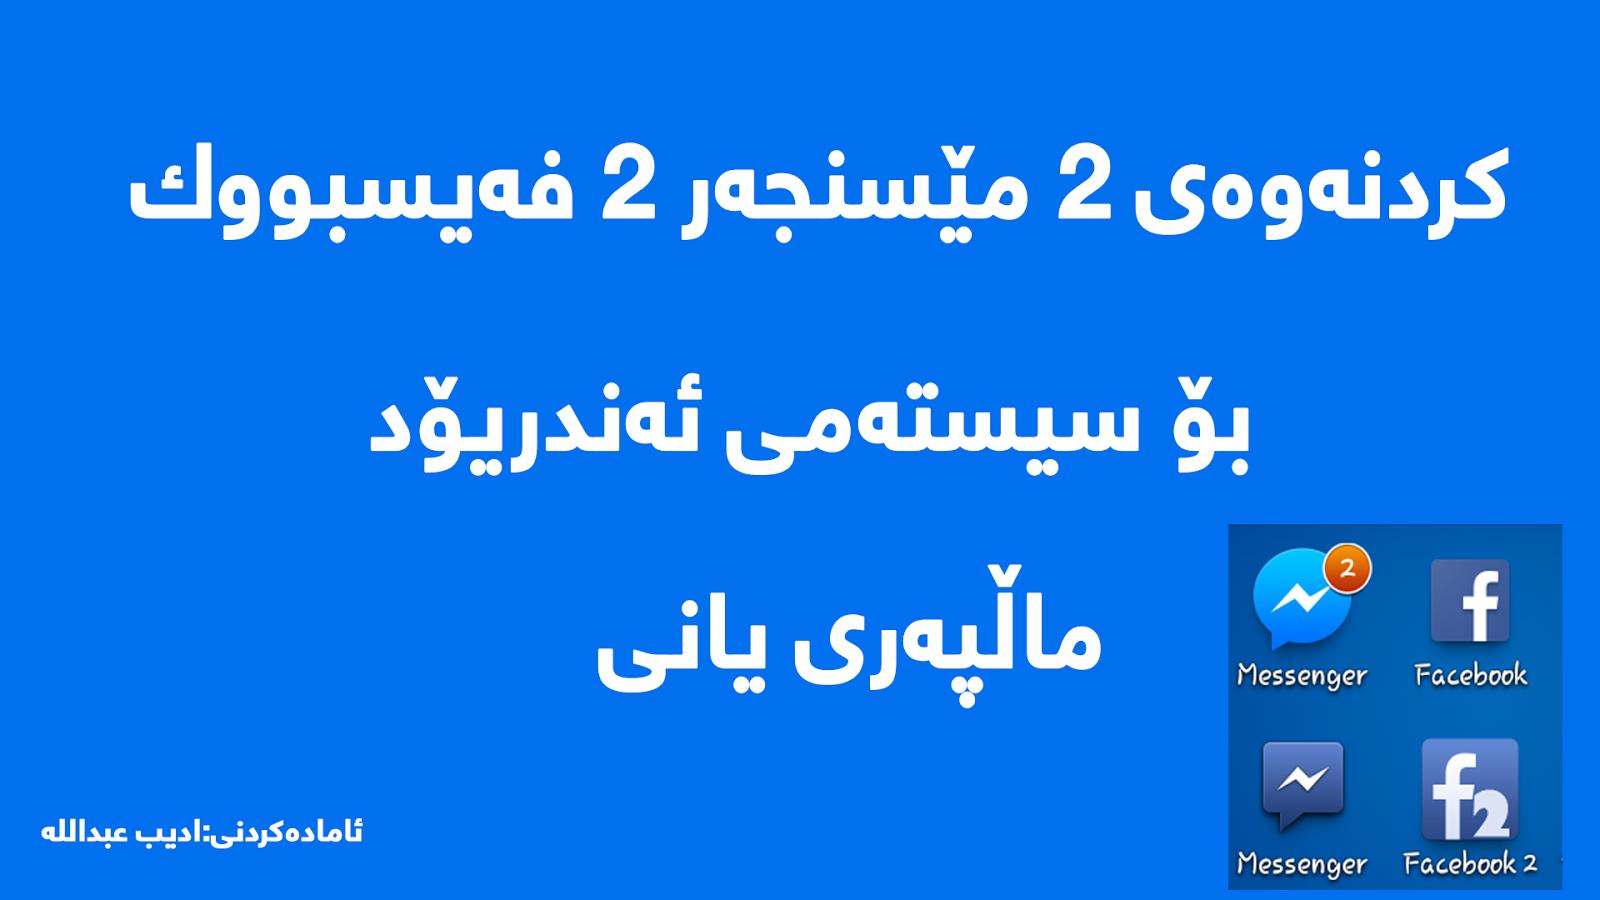 مێسینجهر 2 فهیسبووك 2 بۆ سیستهمی ئهندریۆد Facebook